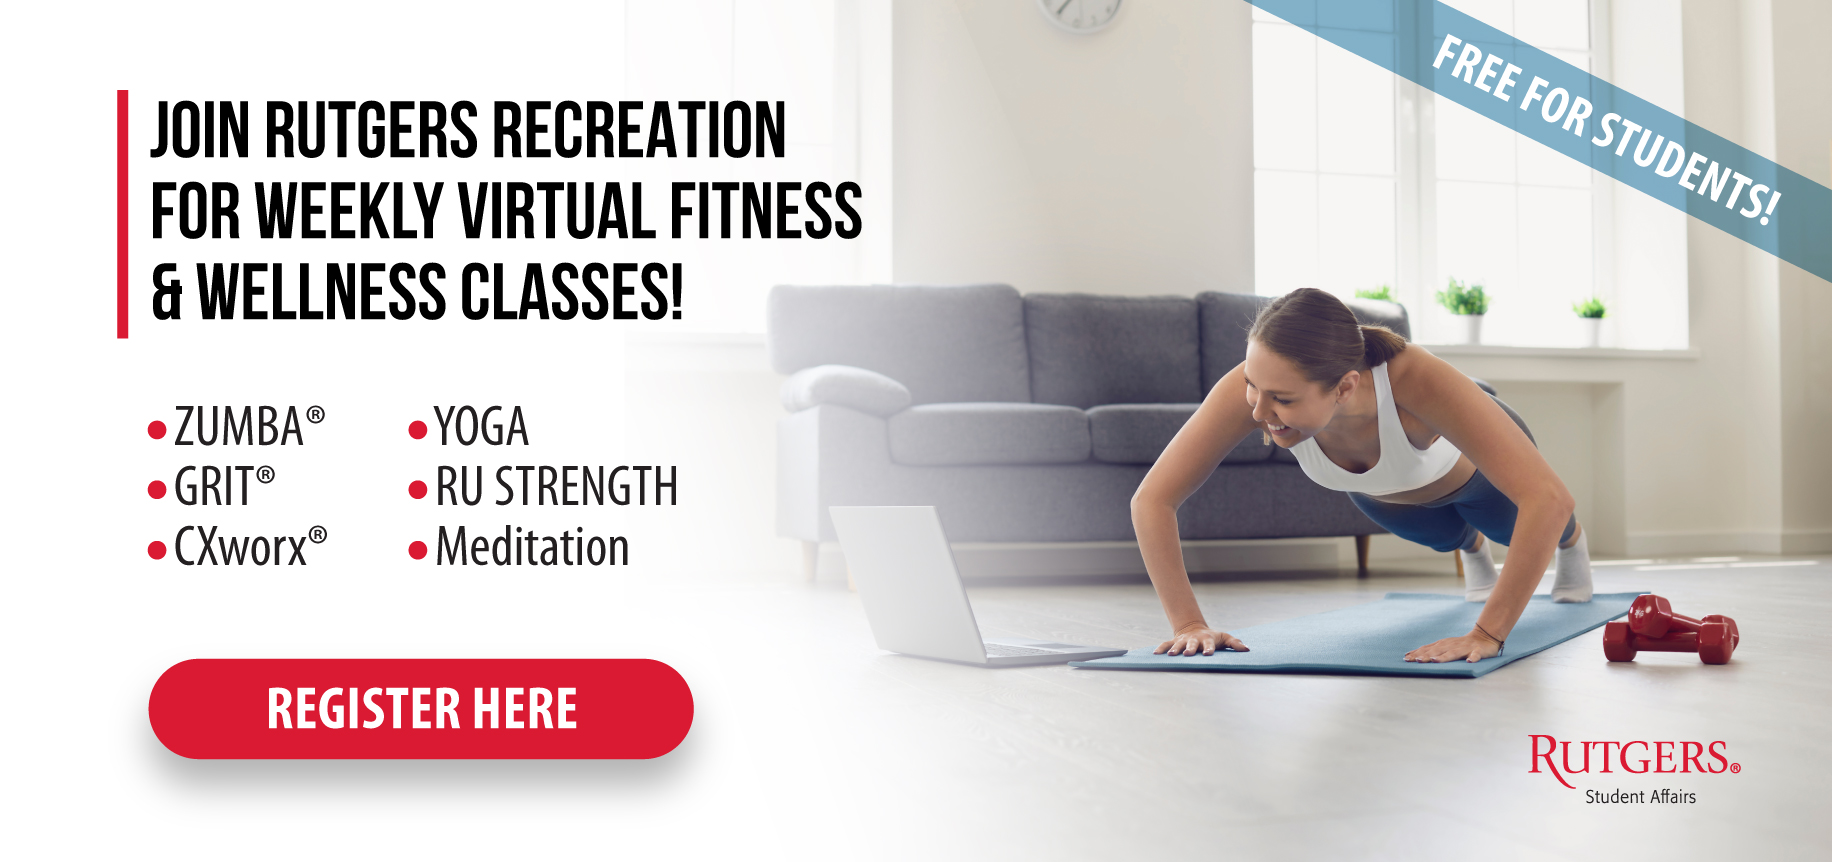 Rec_FitnessClasses_Virtual_January_WebBanner_1832x862_S21_KP-1